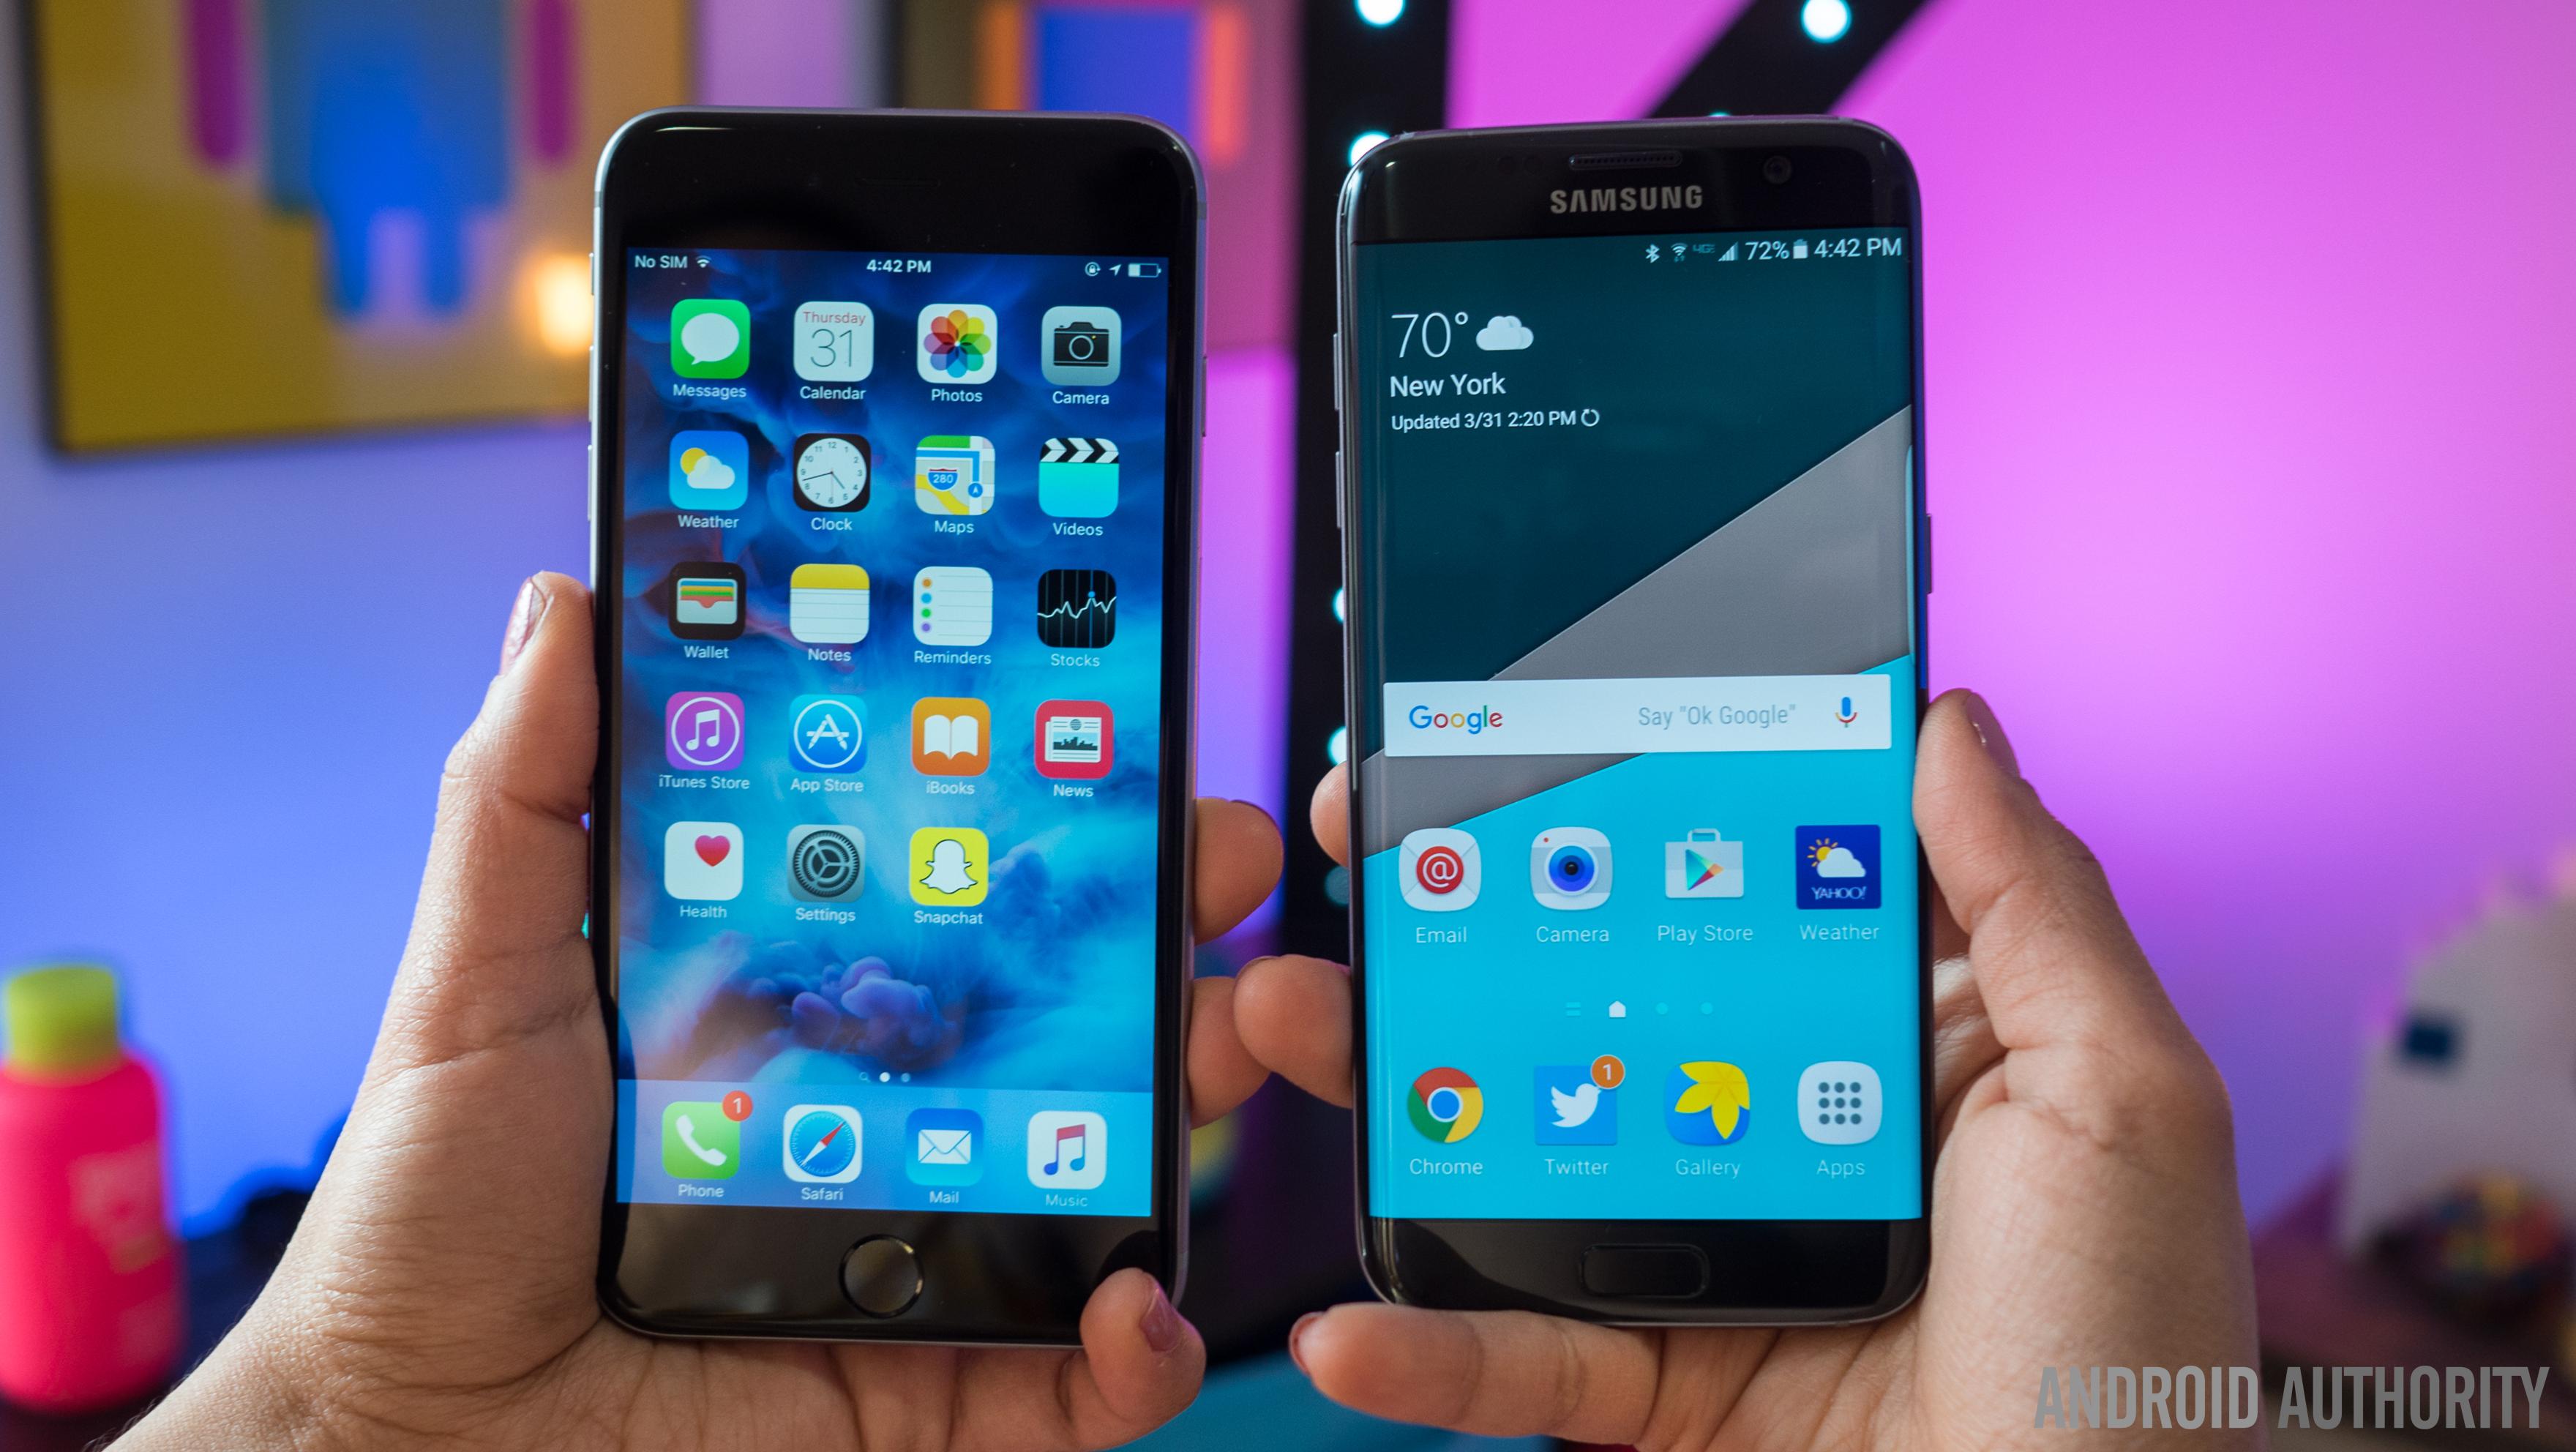 Galaxy-S7-Edge-vs-iPhone-6s-plus-15of18